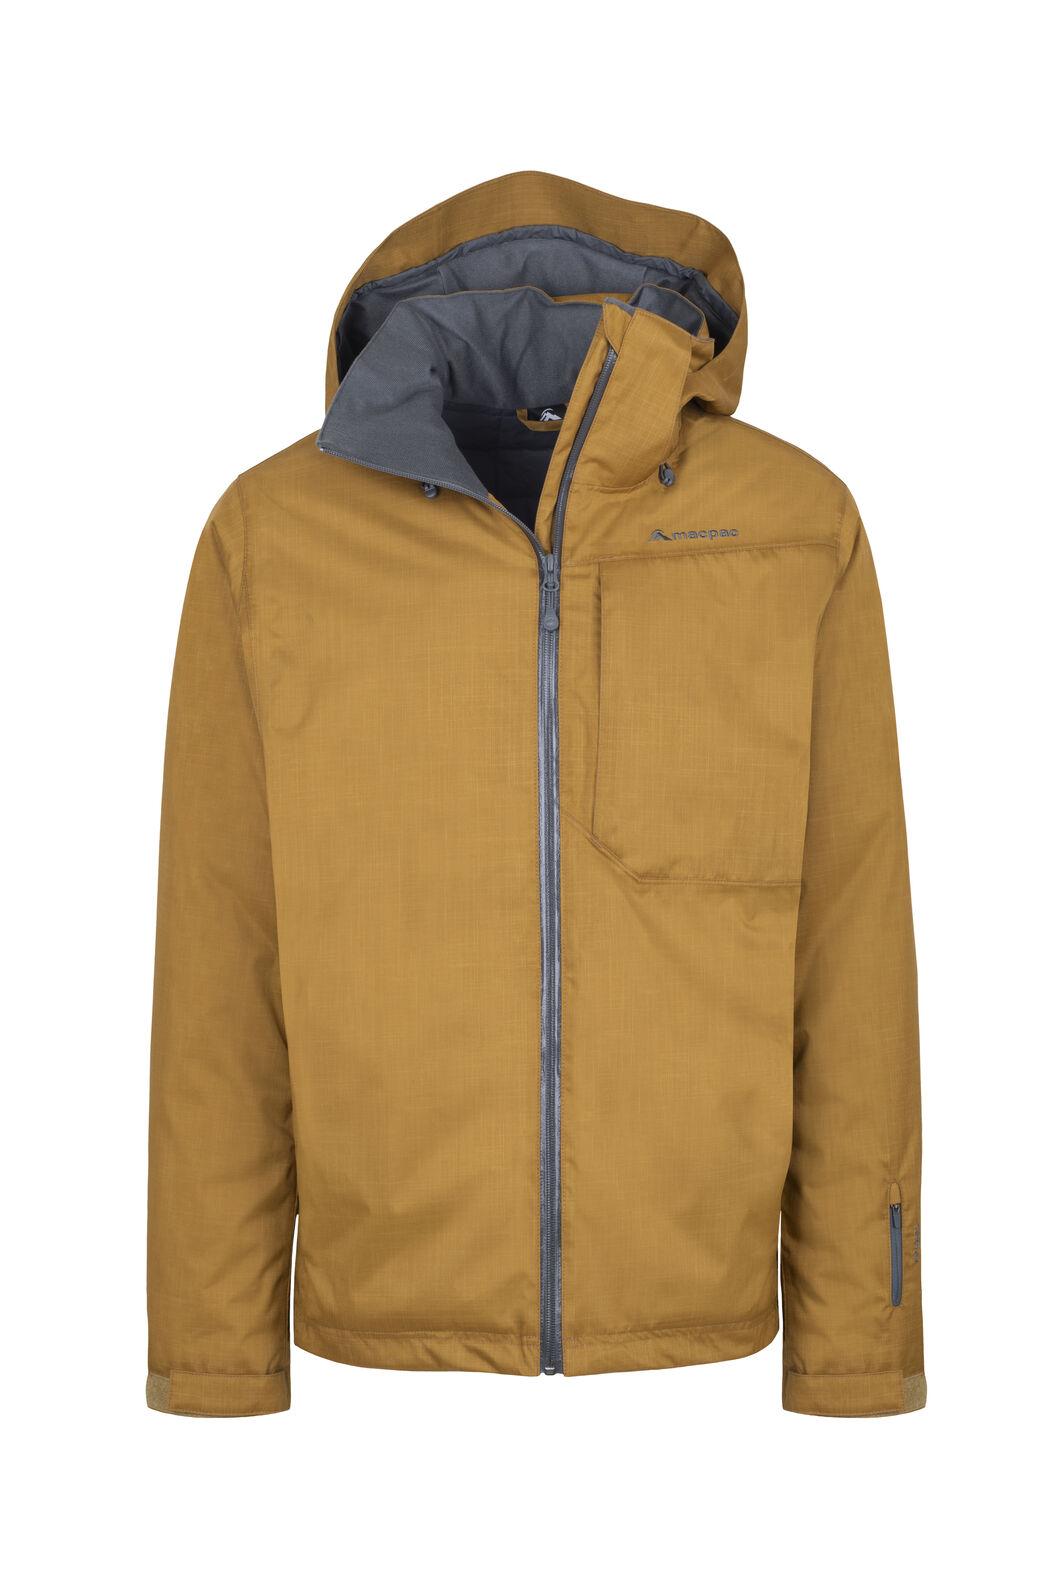 Macpac Powder Reflex™ Ski Jacket — Men's, Bronze Brown, hi-res